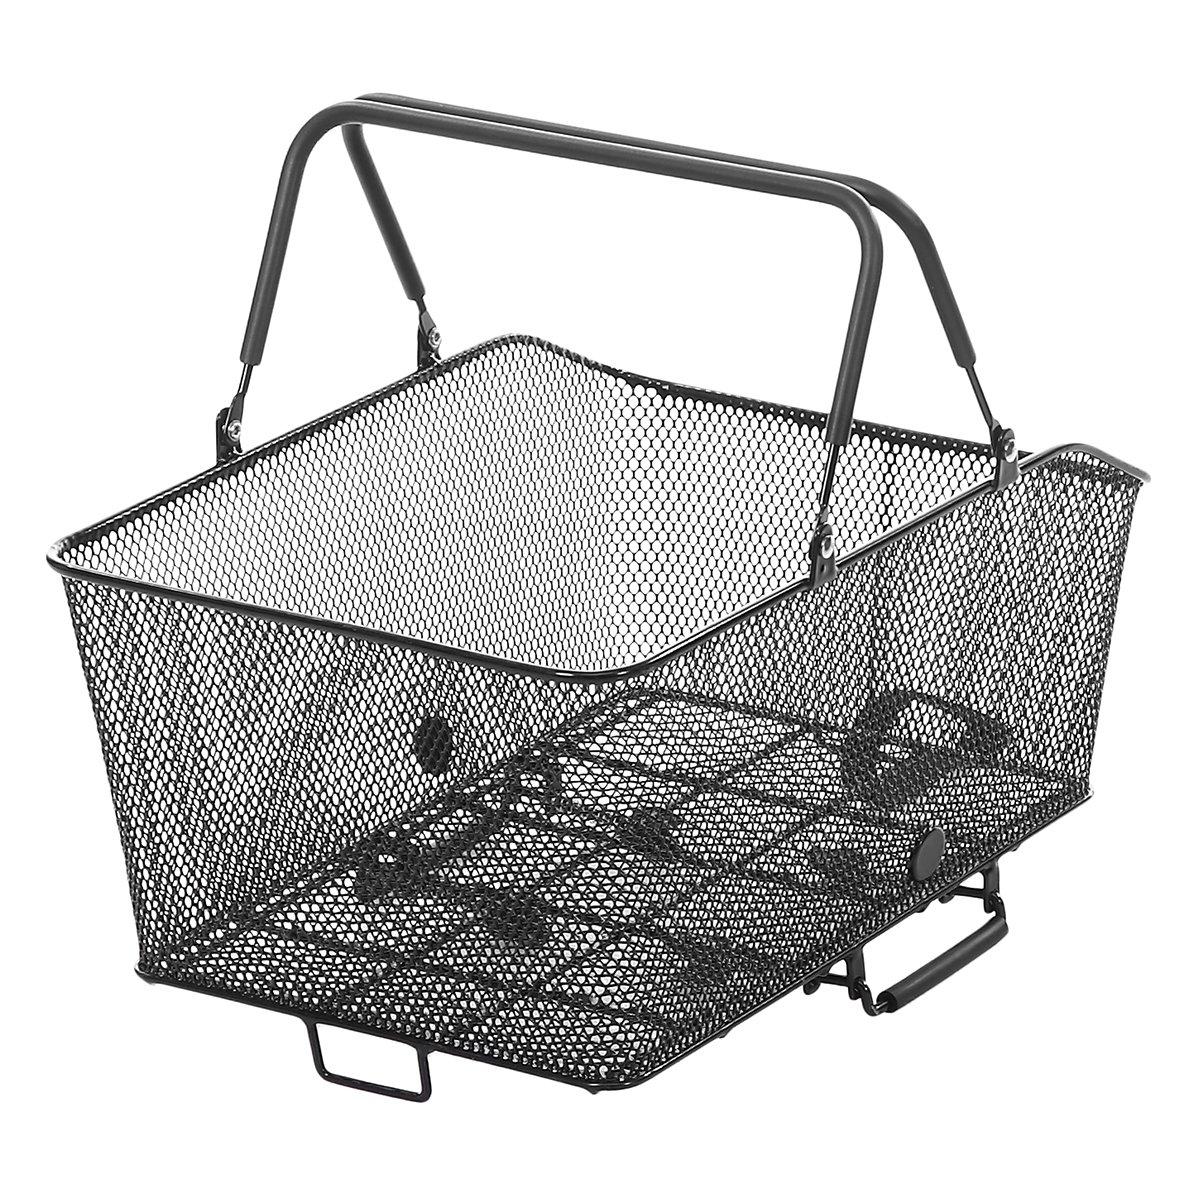 Sunlite Rack Top Mesh QR Grocery Basket by Sunlite   B00KCQHPAA